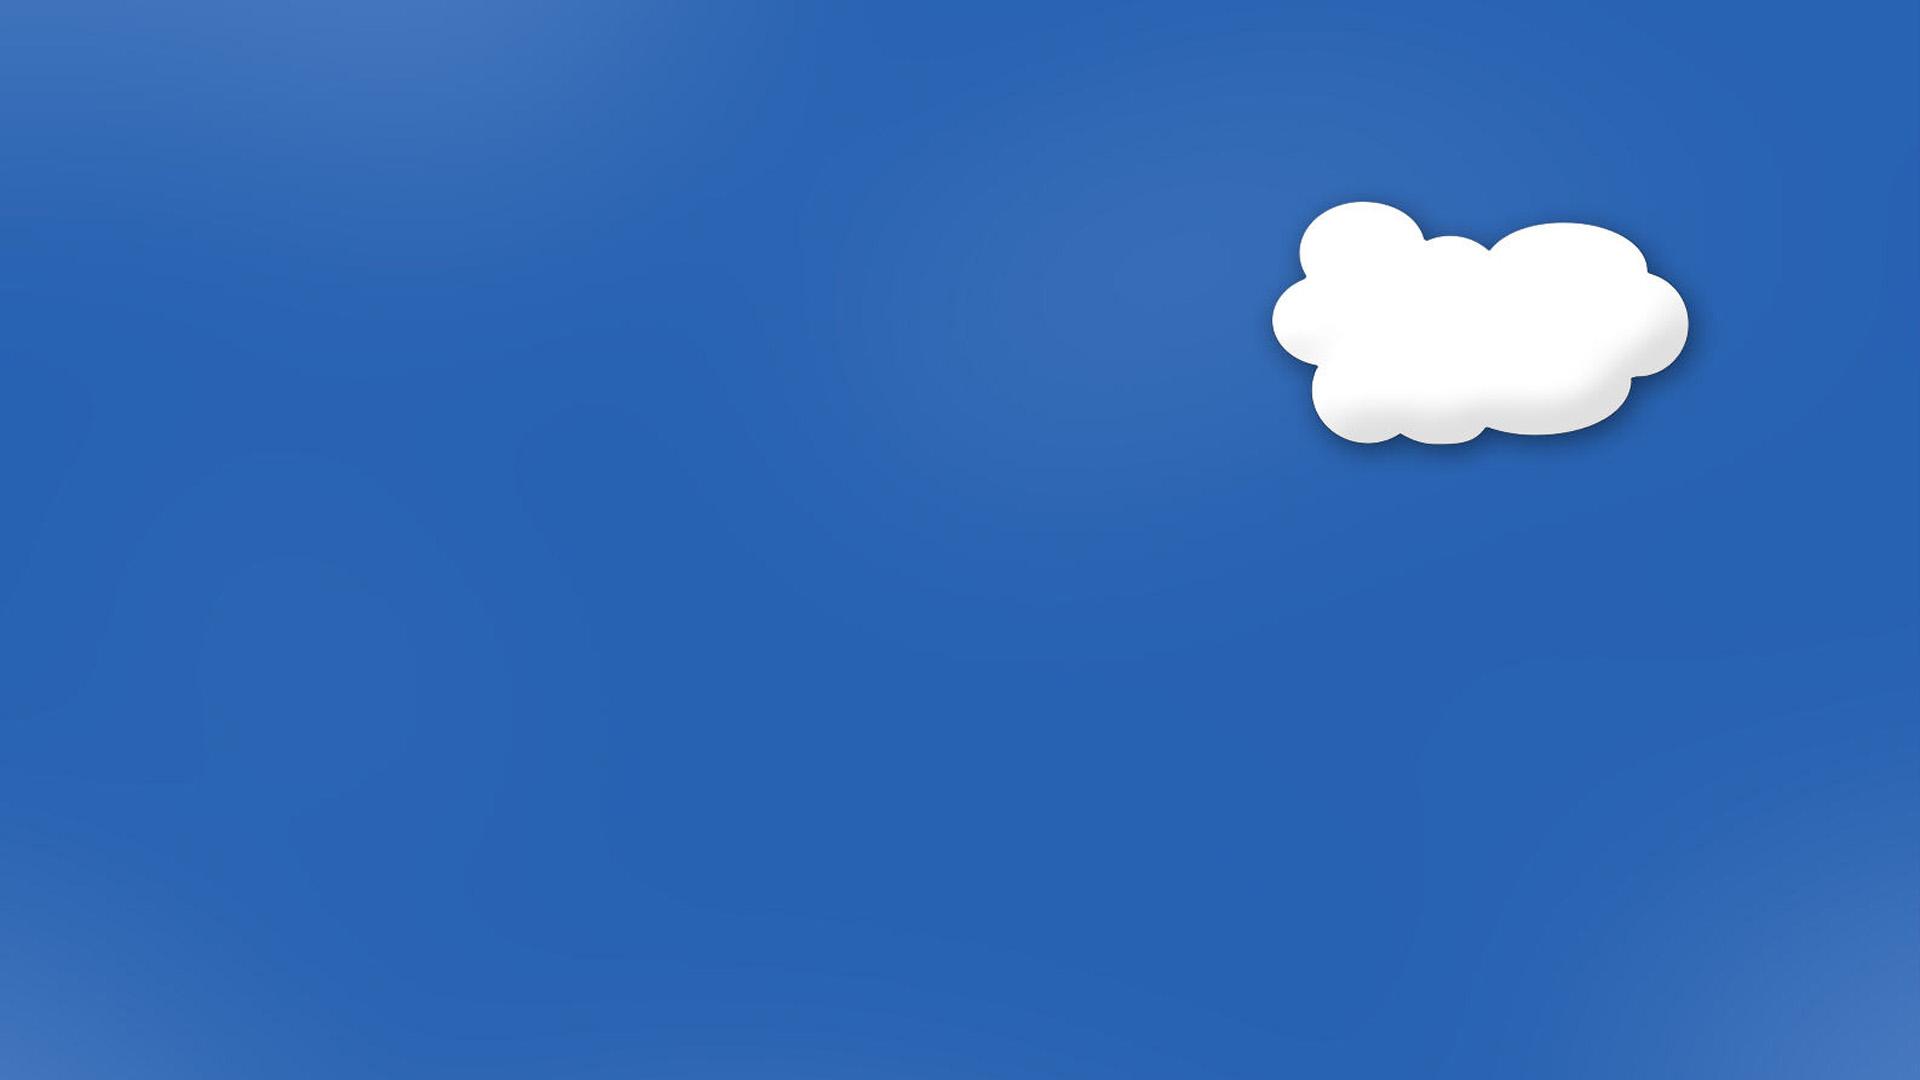 cloud wallpaper cartoon